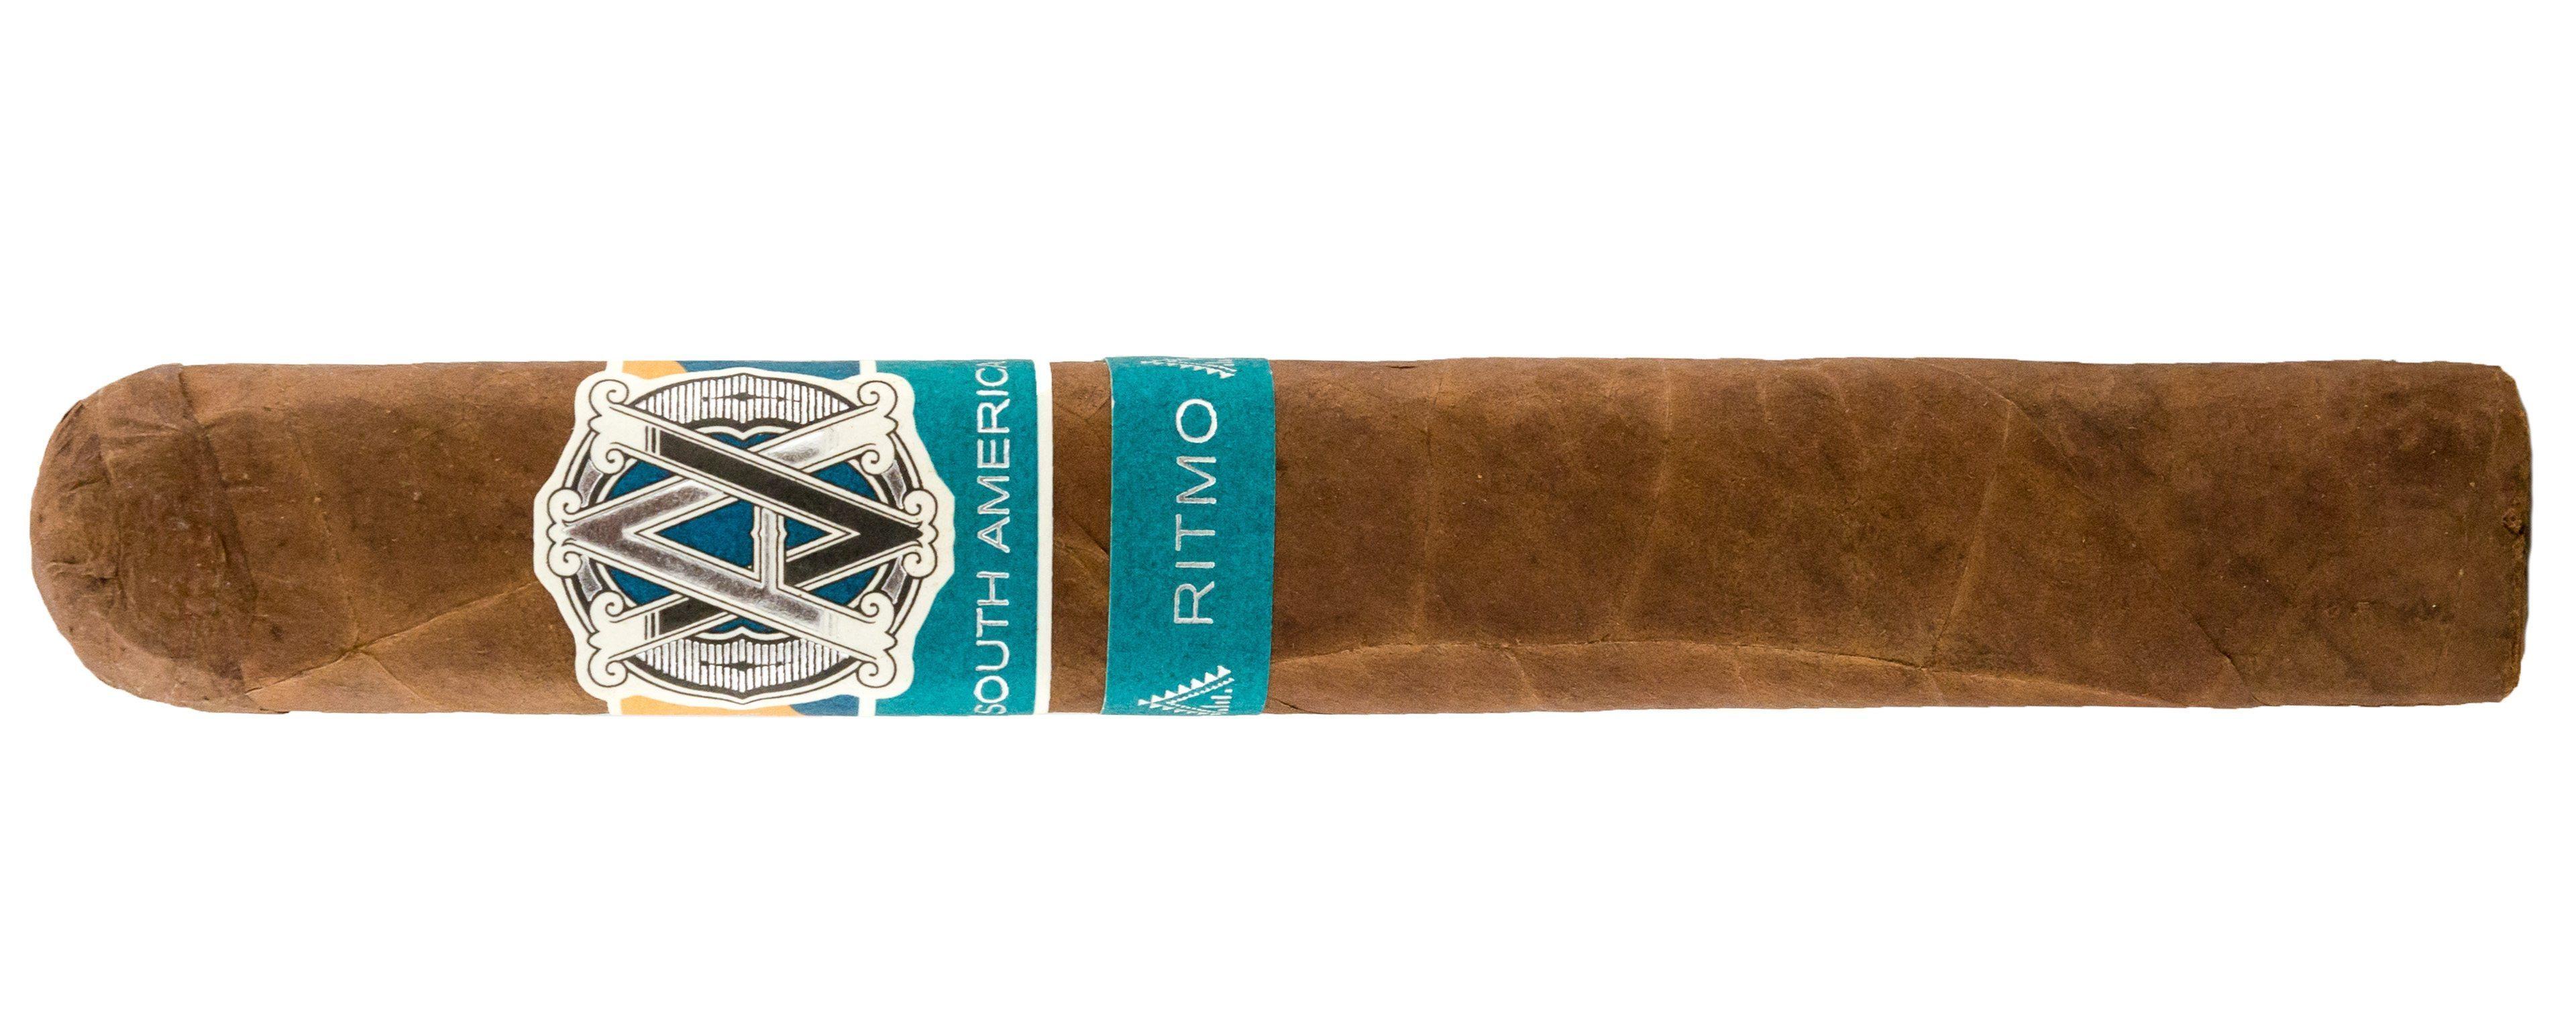 Blind Cigar Review: AVO Syncro South America Ritmo Toro